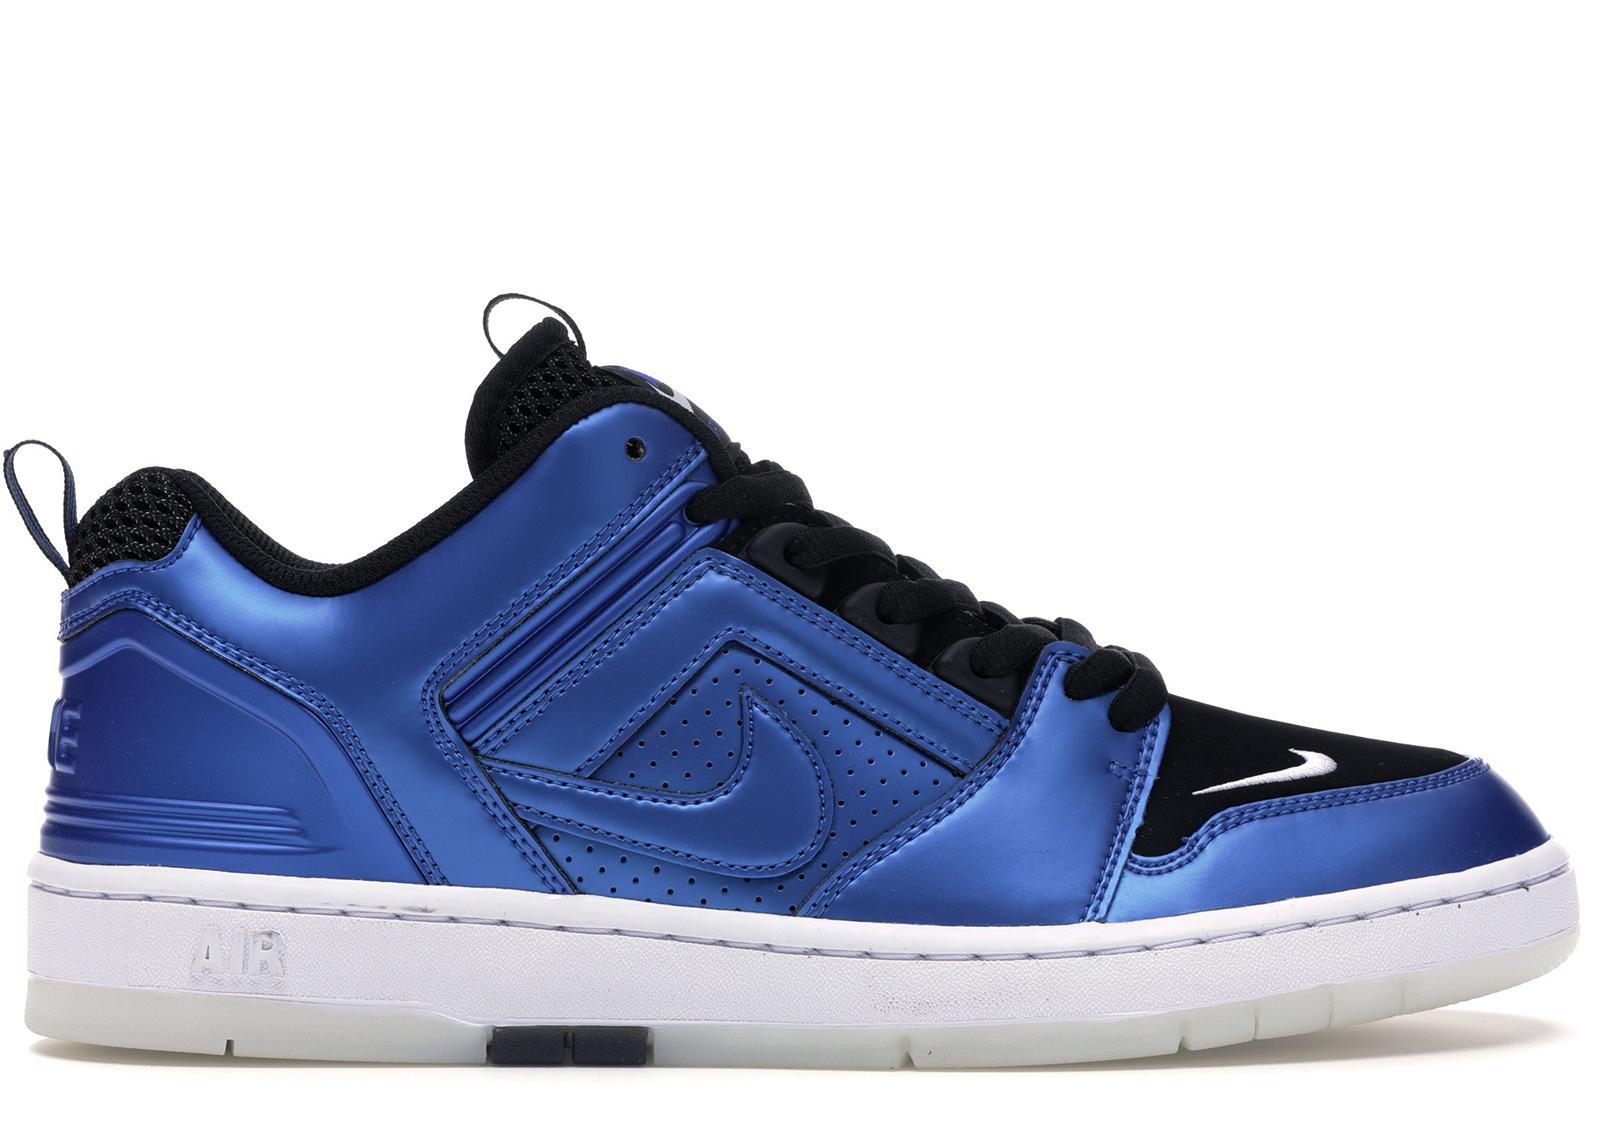 Nike SB Air Force 2 Low Foamposite